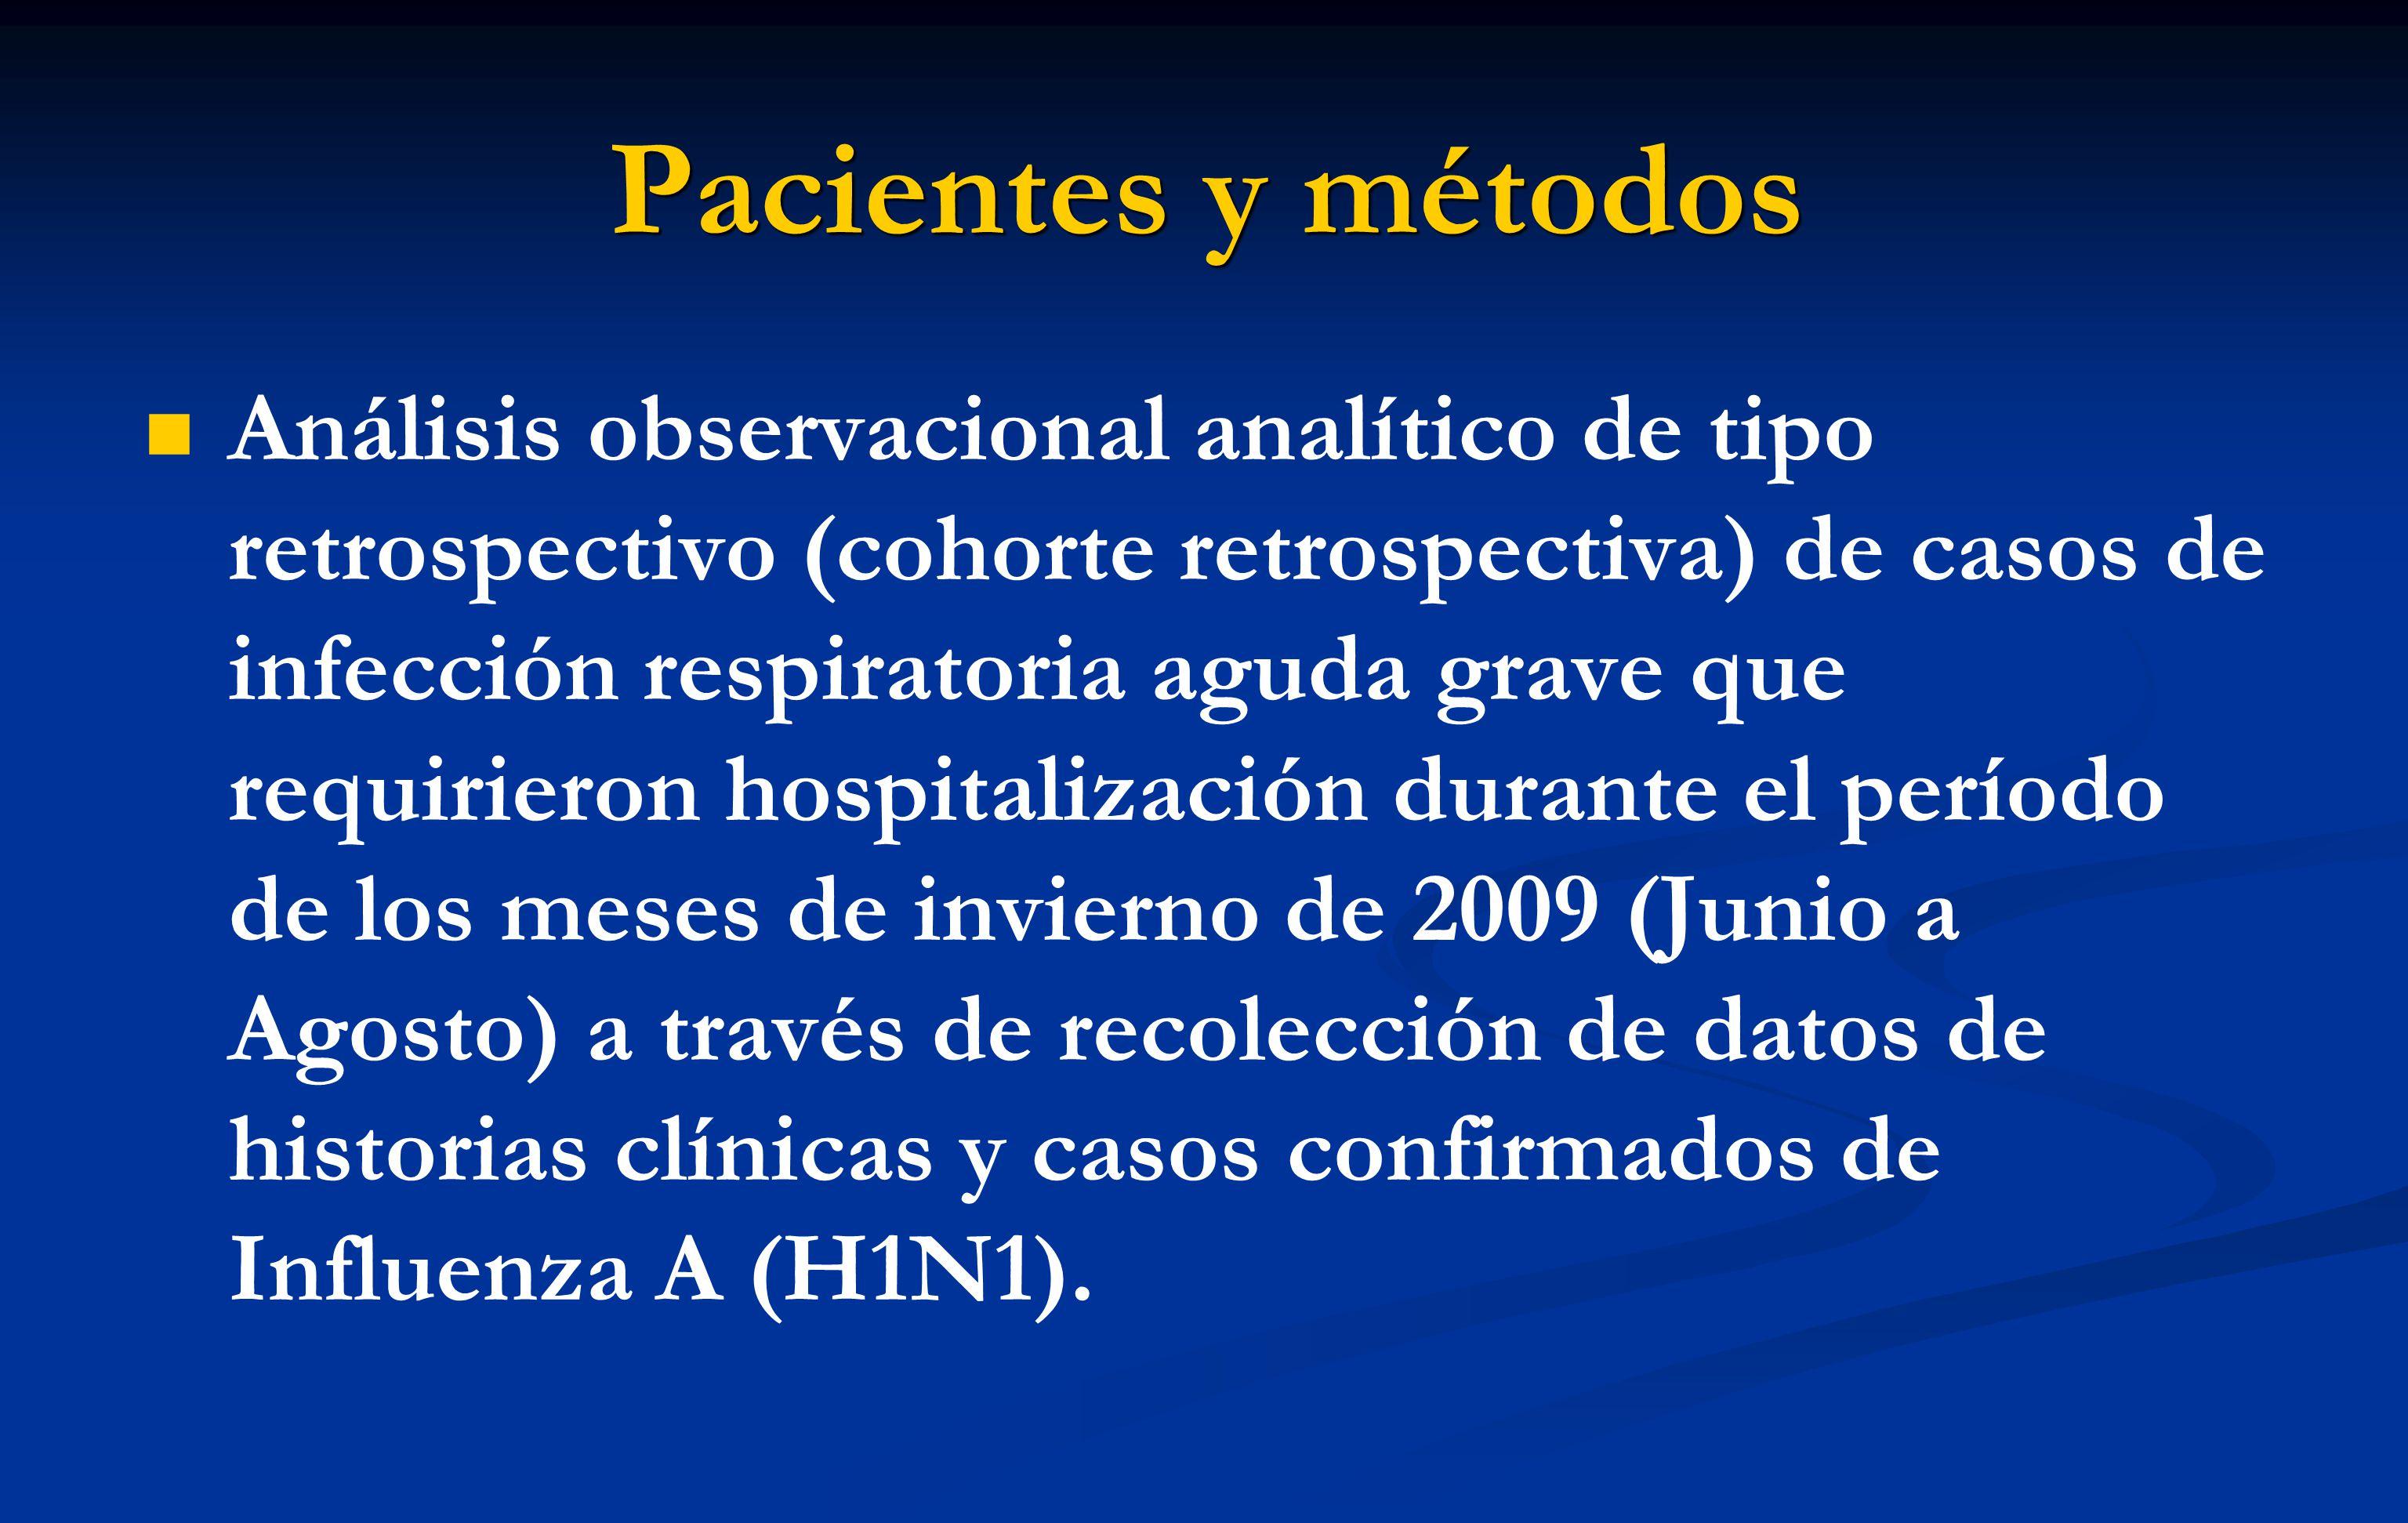 Pacientes y métodos Análisis observacional analítico de tipo retrospectivo (cohorte retrospectiva) de casos de infección respiratoria aguda grave que